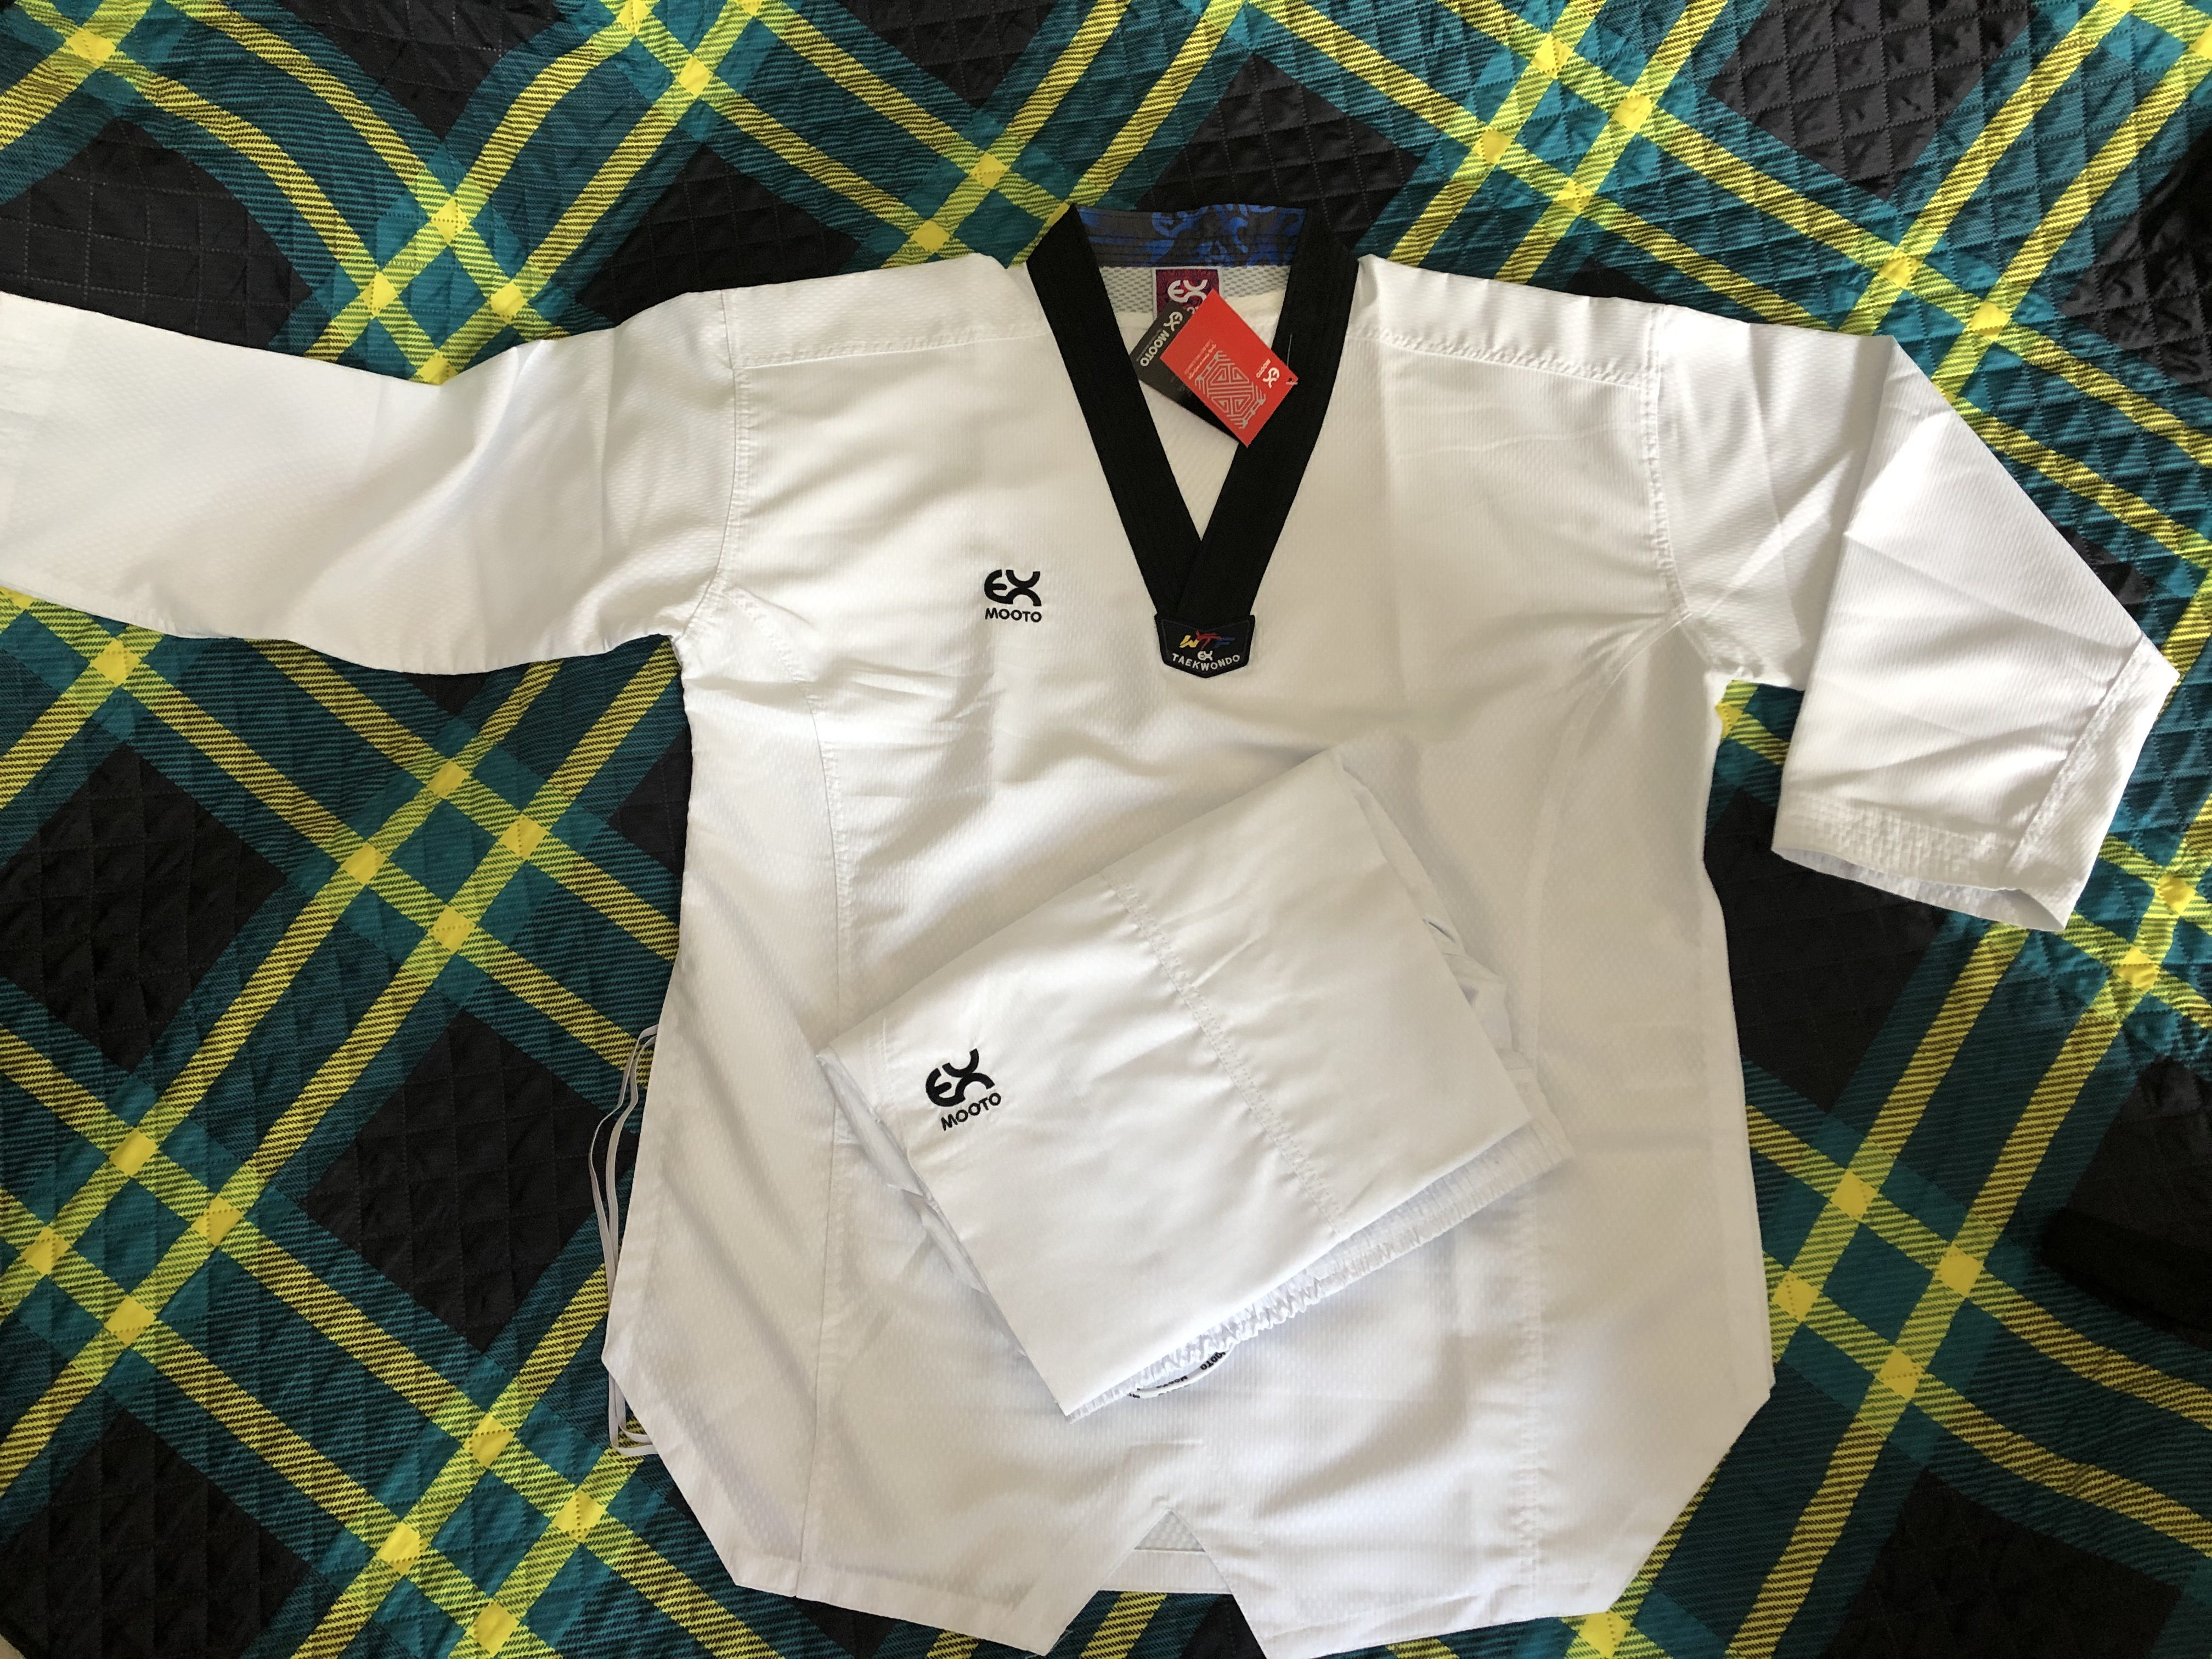 EX MOOTO EXTREA S5 Professional Sparring  Taekwondo uniforms Lighter Softer Faster uniform Children Adult MOOTO Taekwondo suit